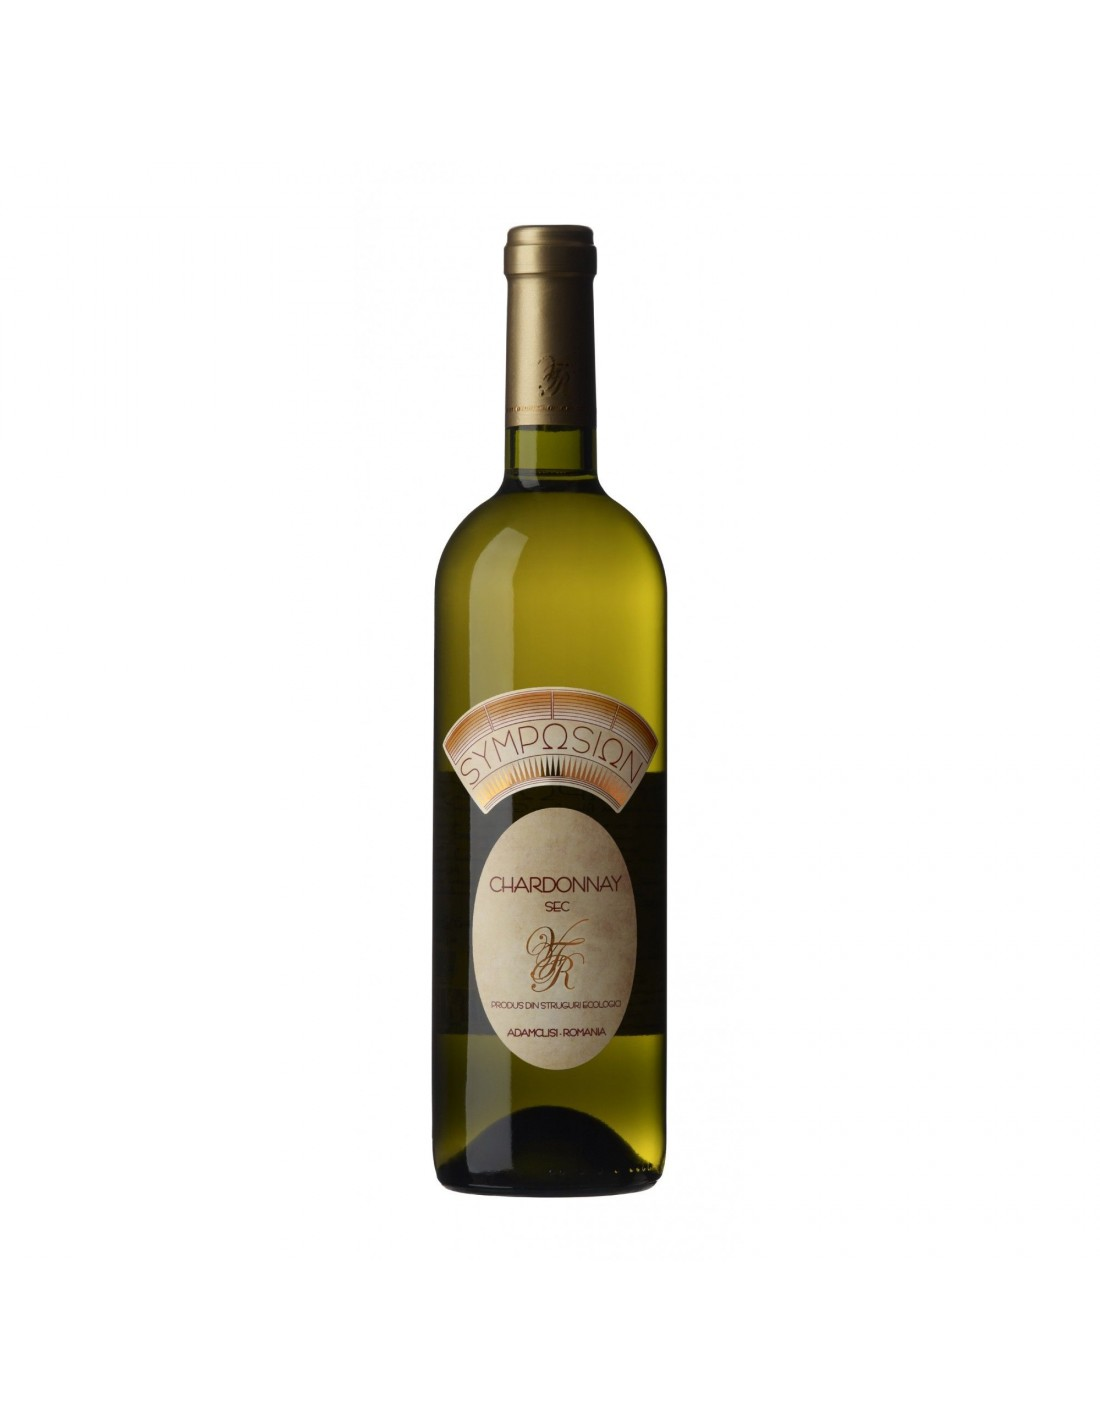 Vin alb sec, Chardonnay, Symposion Adamclisi, 0.75L, 14% alc., Romania